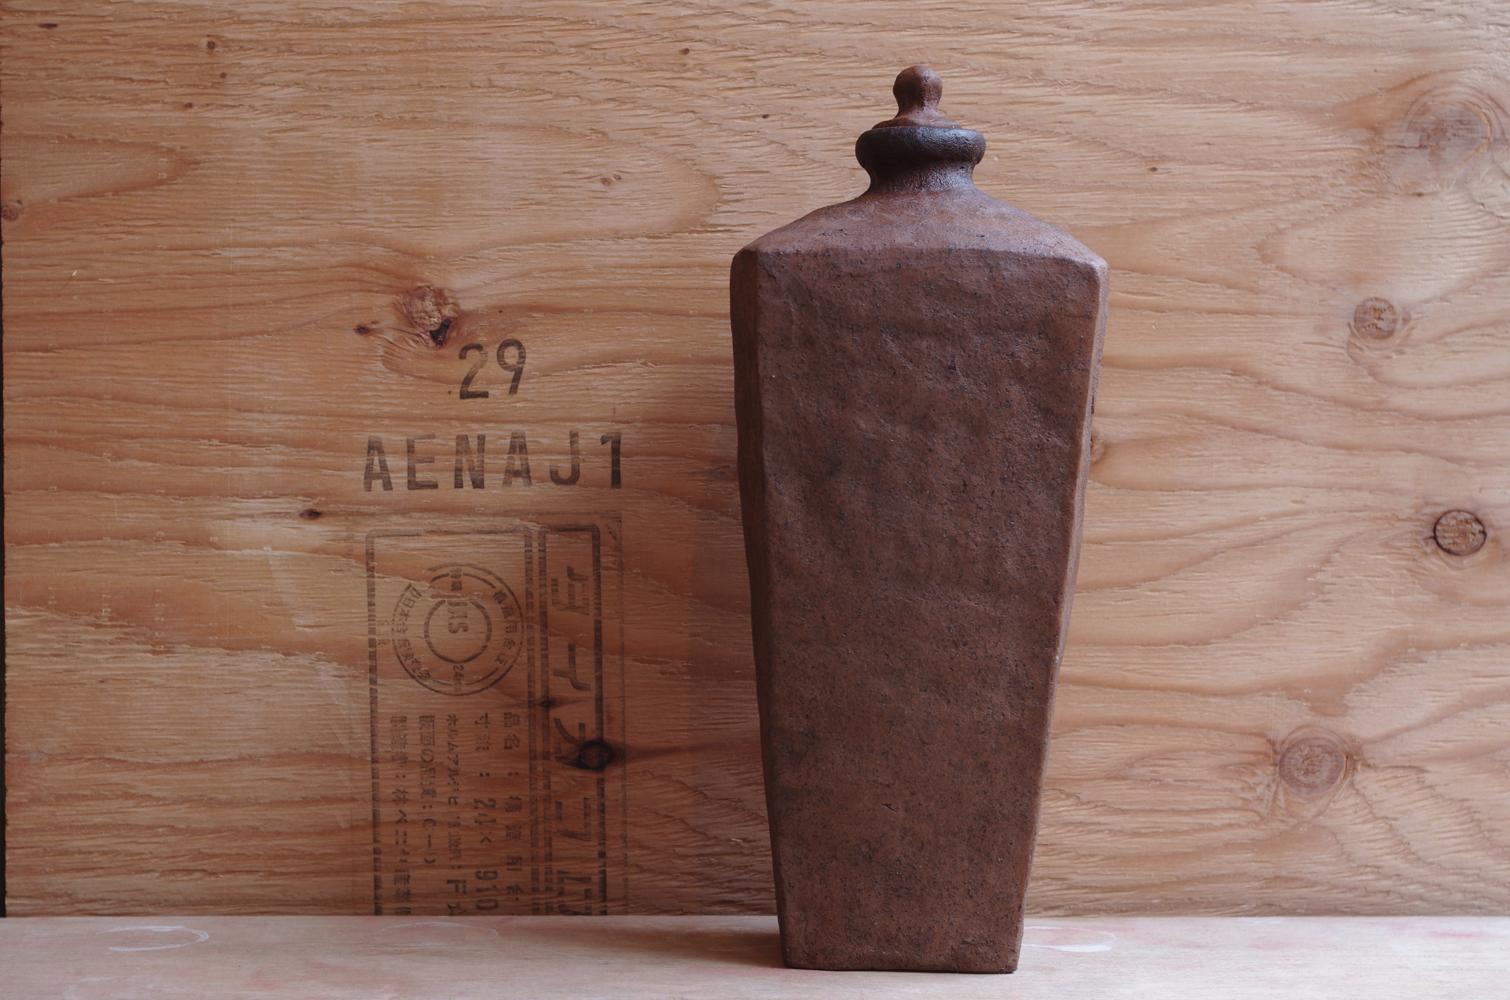 yoji-yamada-works-35